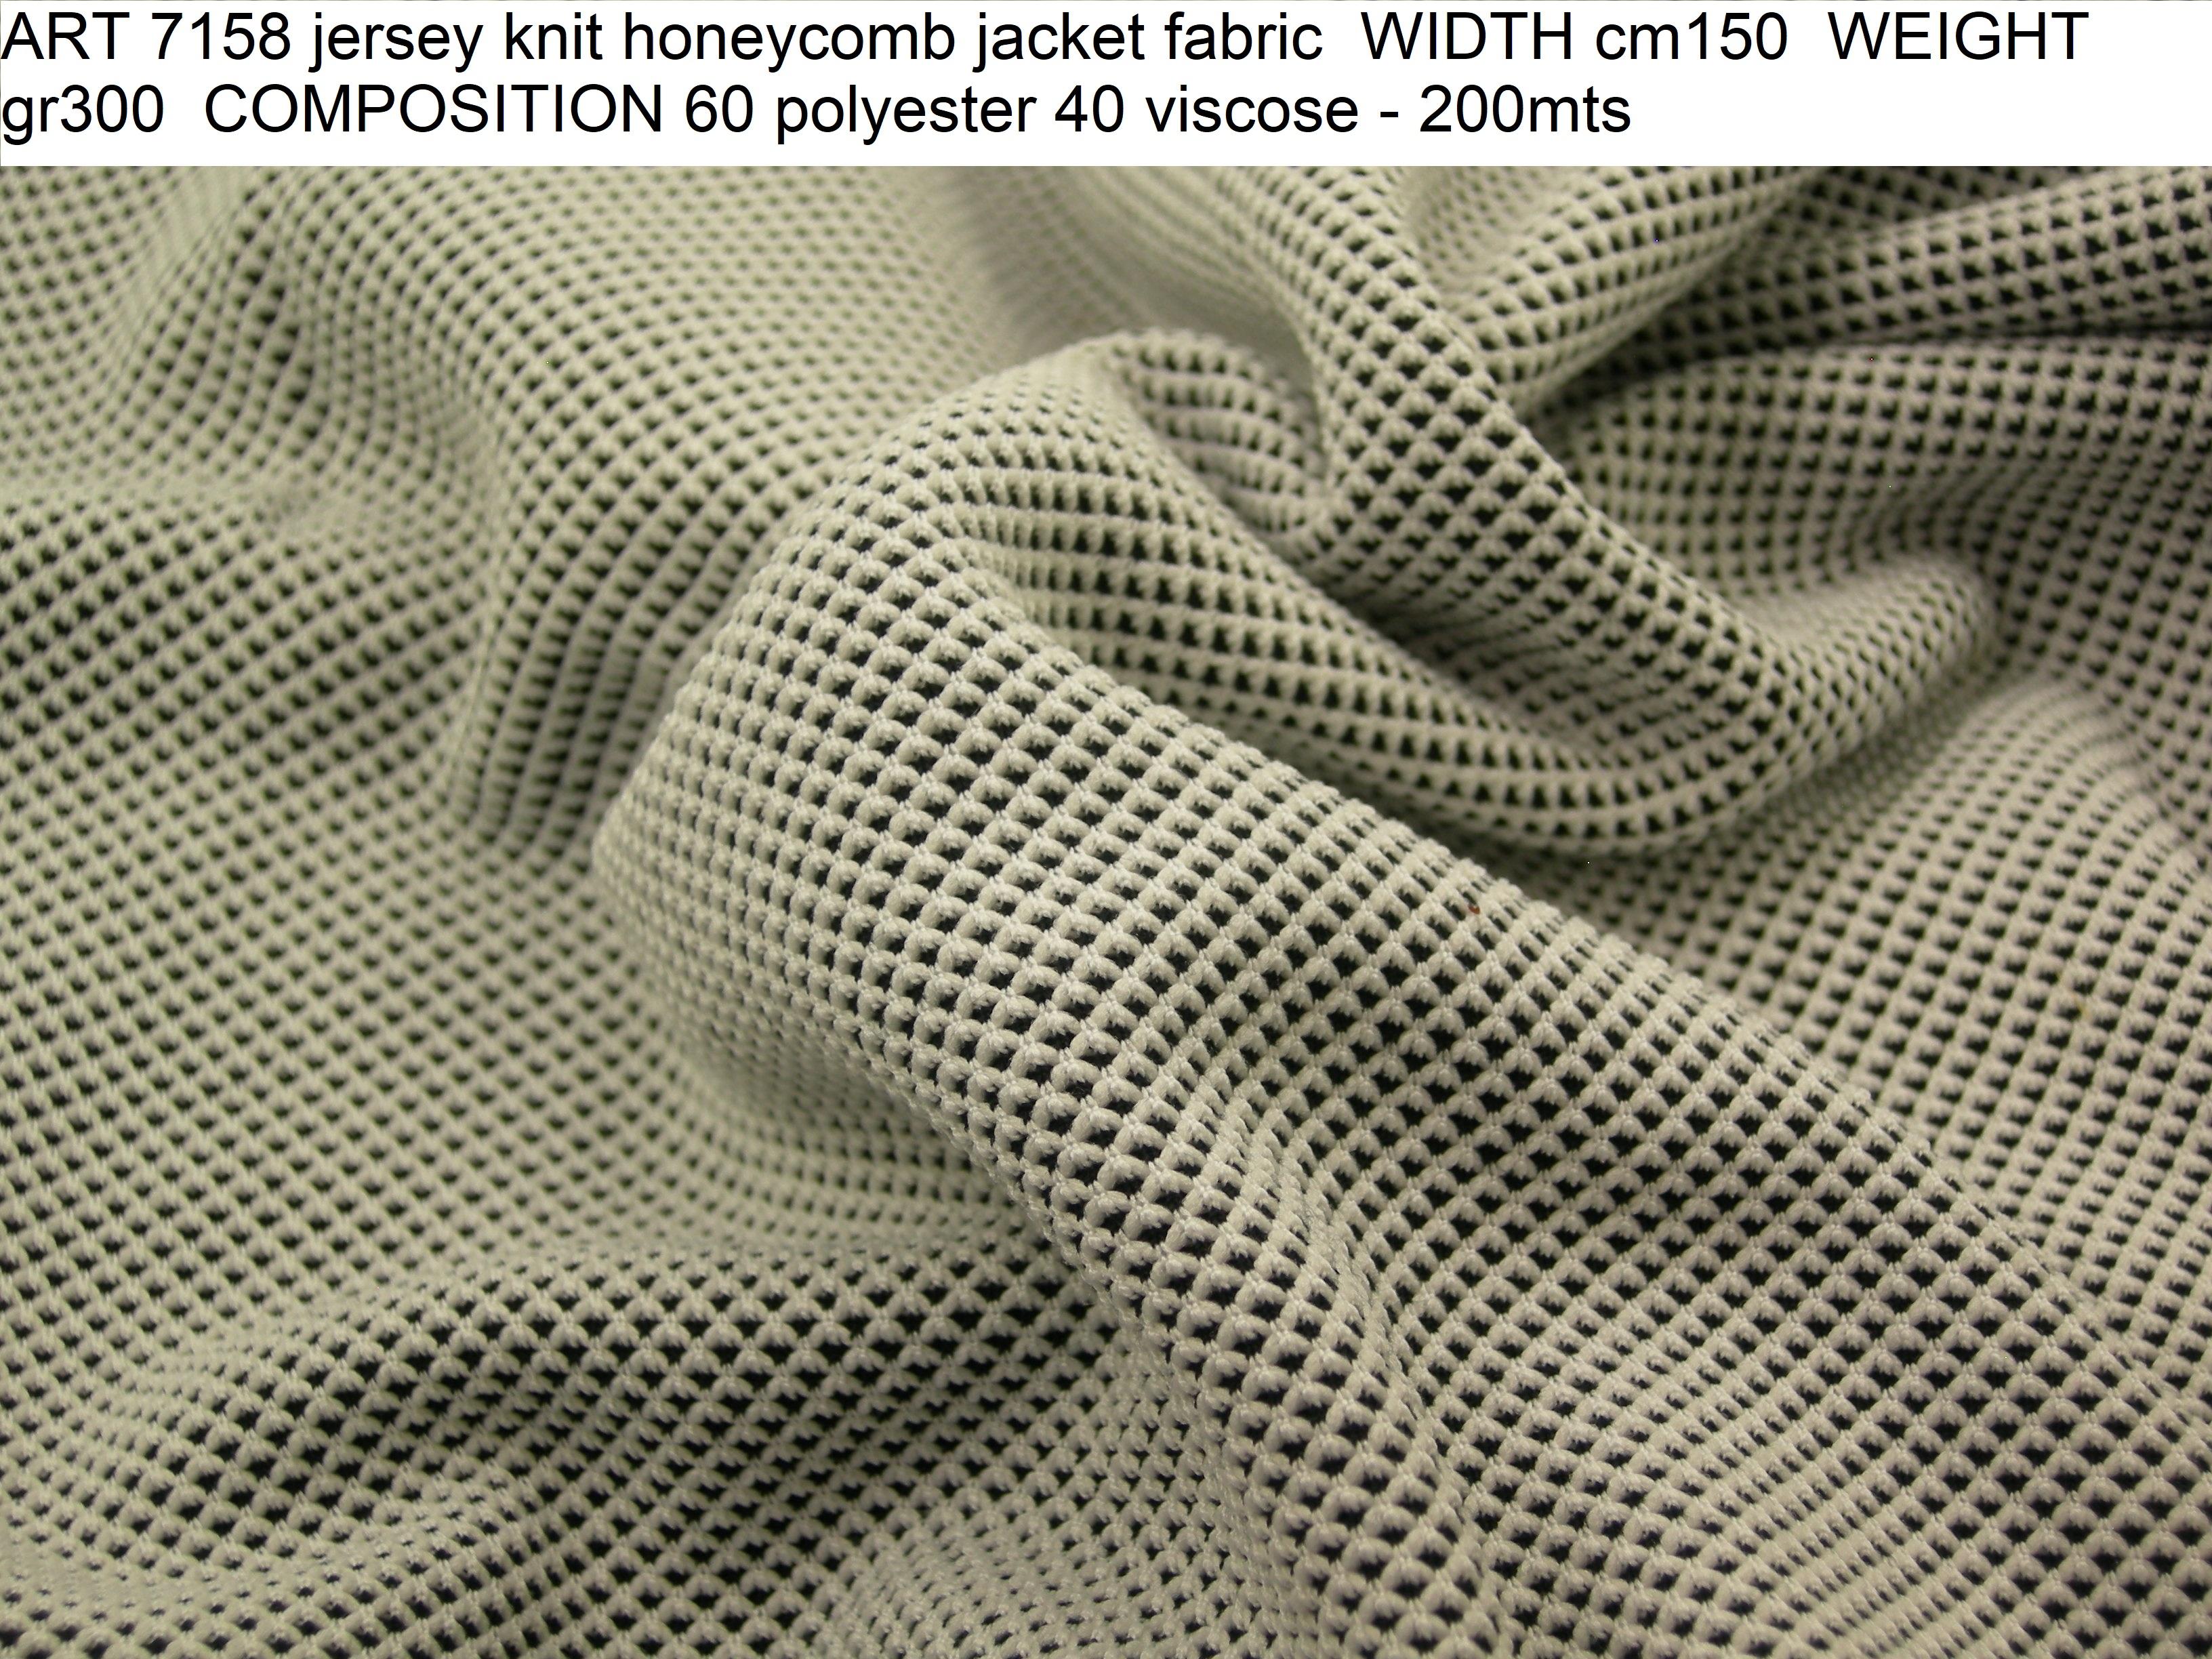 ART 7158 jersey knit honeycomb jacket fabric WIDTH cm150 WEIGHT gr300 COMPOSITION 60 polyester 40 viscose - 200mts